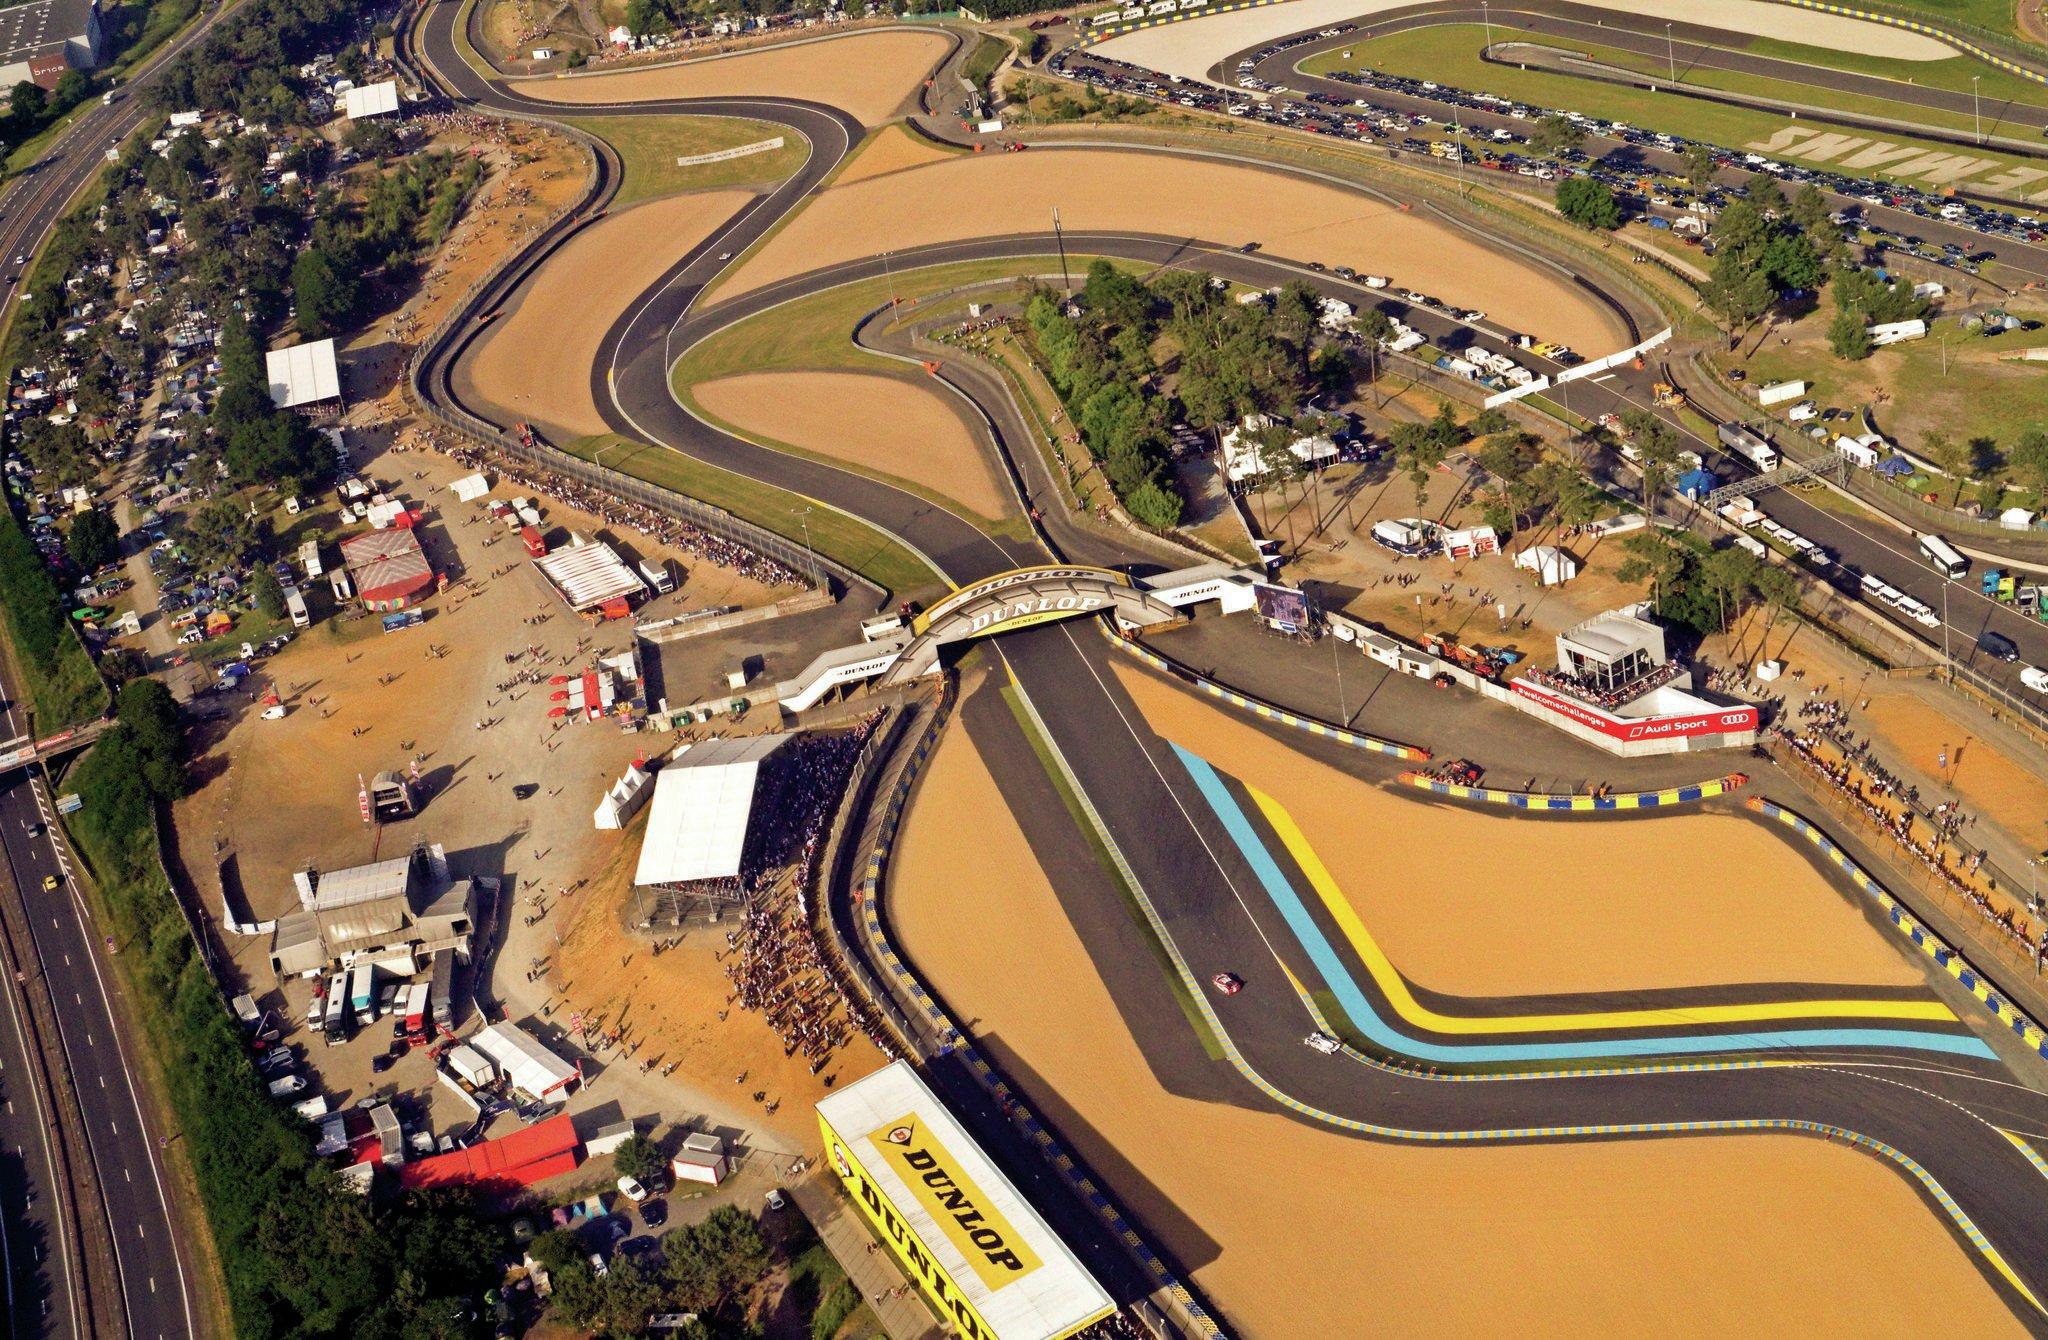 Circuit De La Sarthe From Above